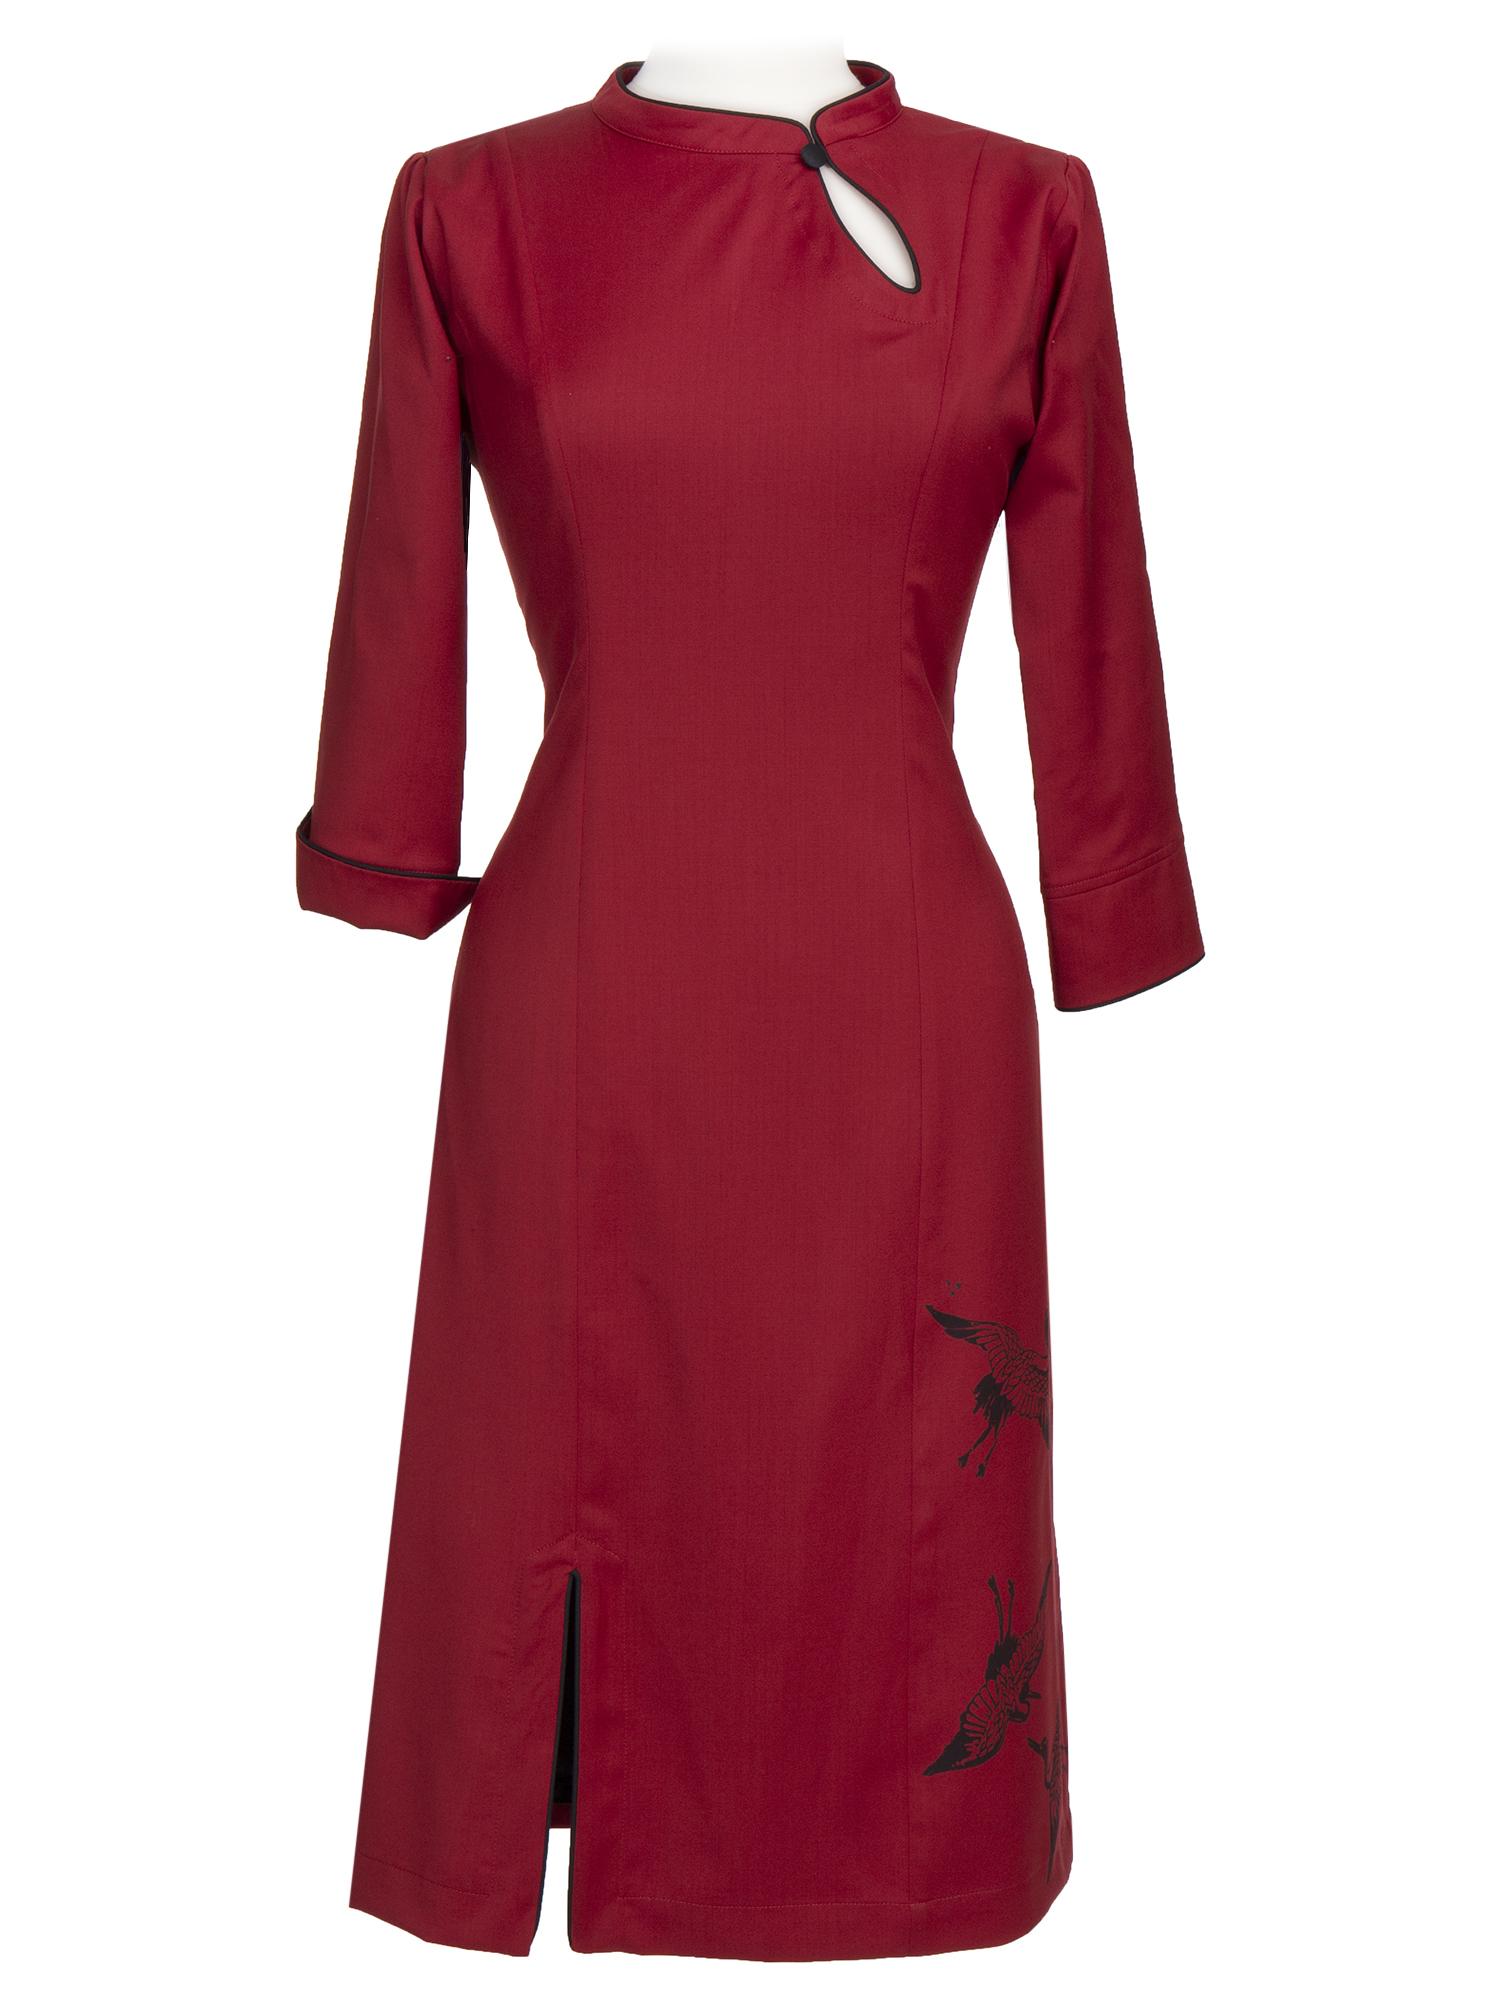 10ac3711c89c Sia - Rød kjole - Ecouture